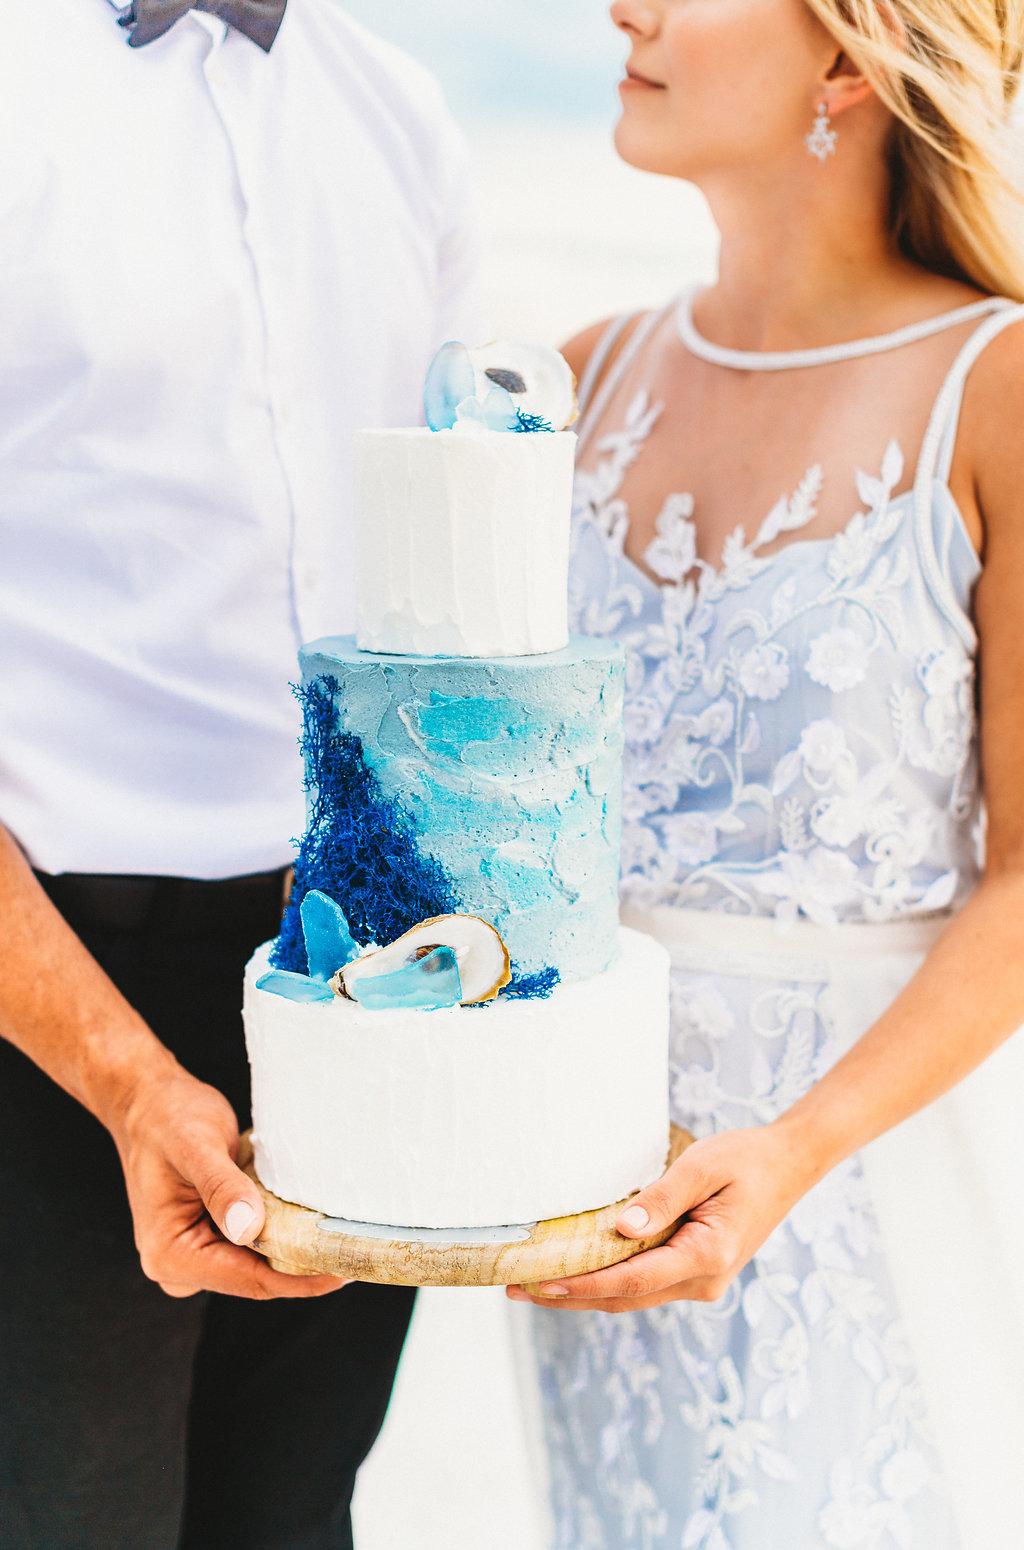 Coastal, Redington Shores Bride and Groom Wedding Portrait Holding Three Tier White and Blue Wedding Cake